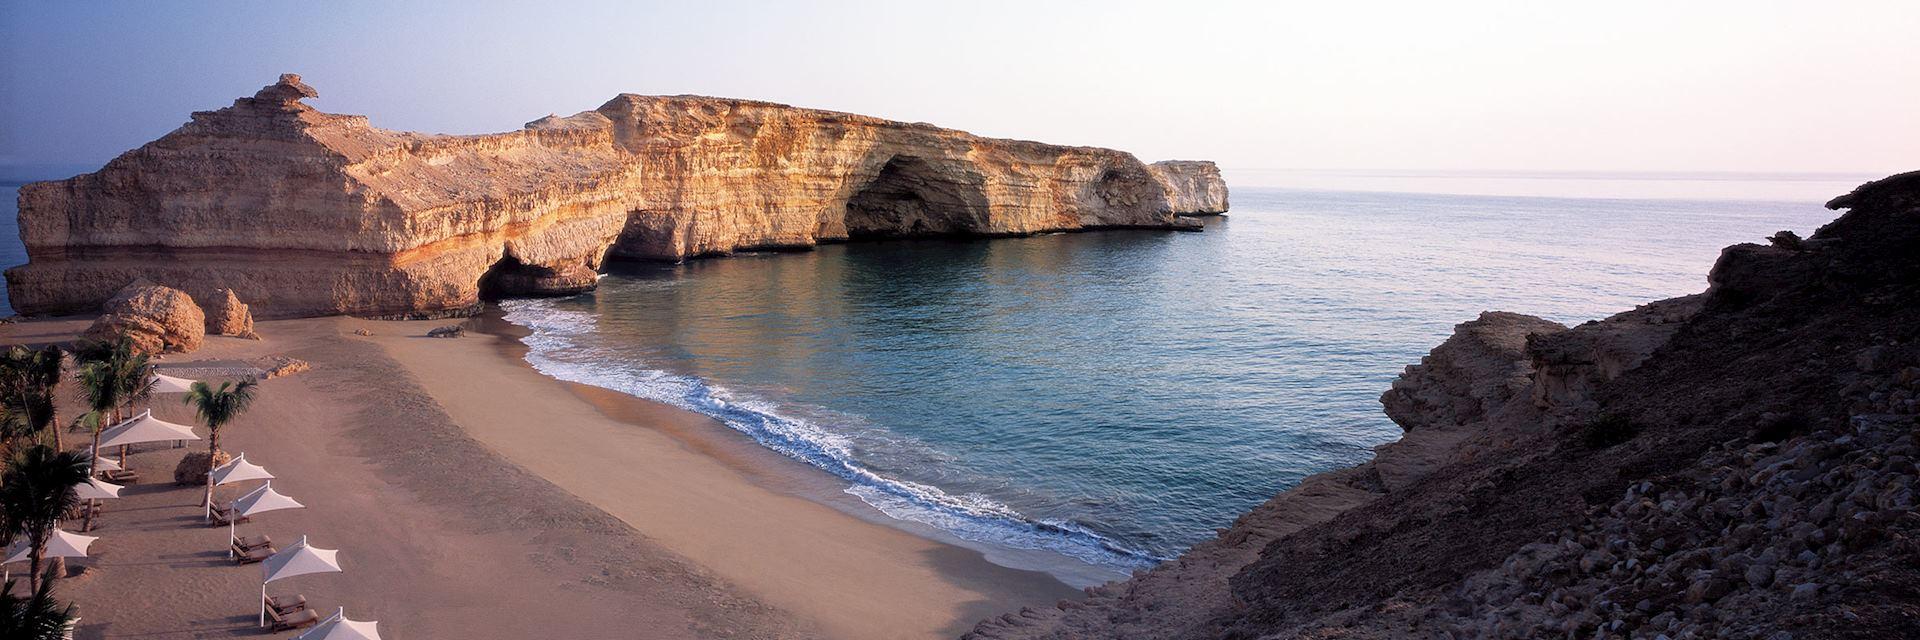 Beach at Shangri-La Barr al Jissah - Al Husn, Oman